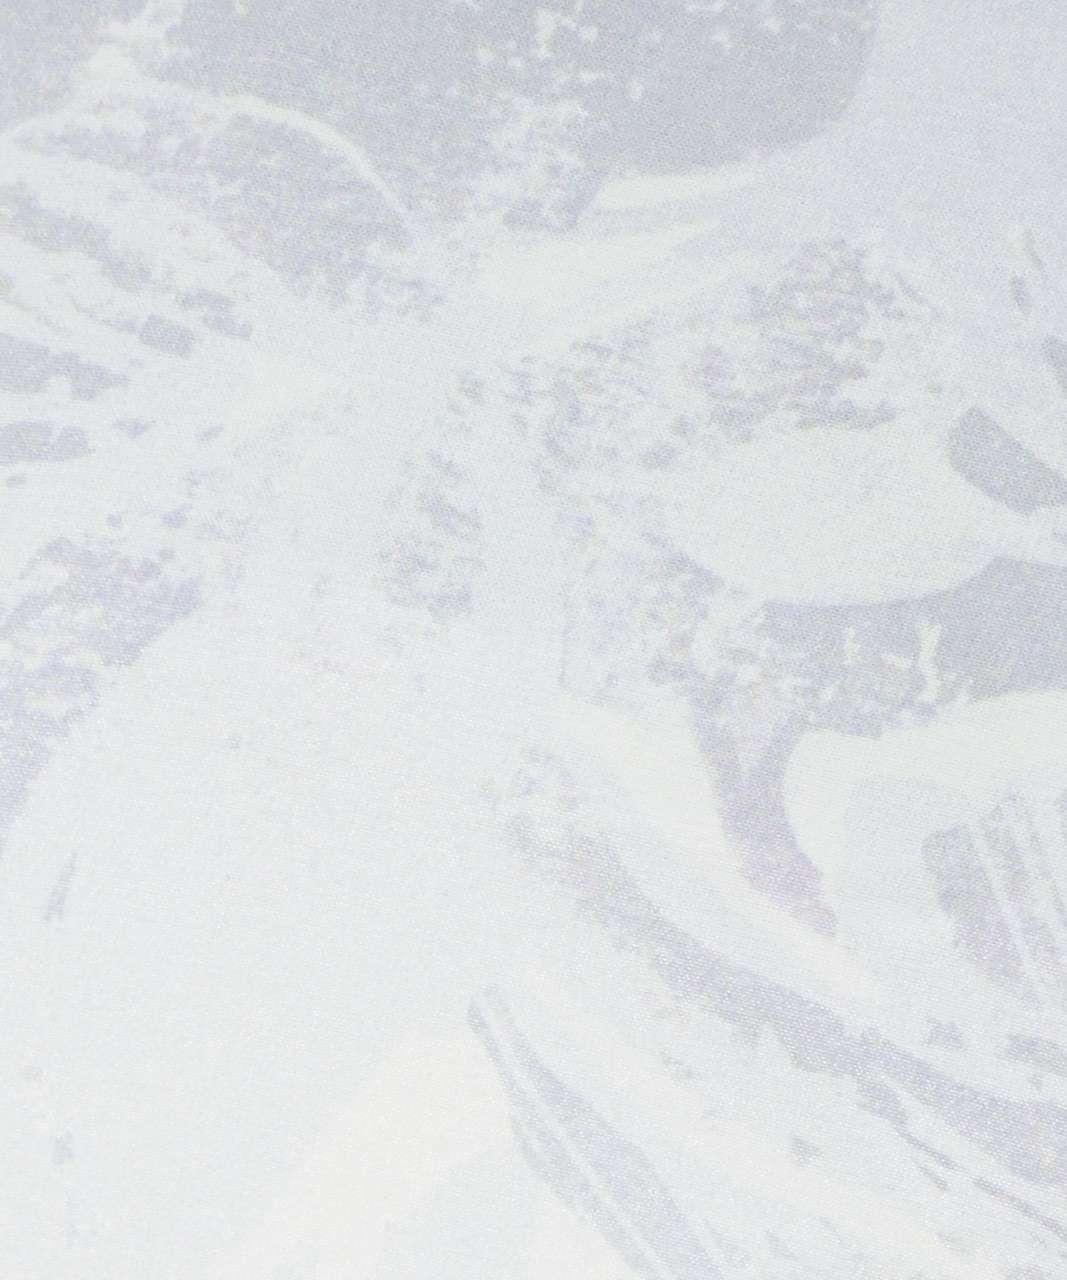 "Lululemon Hotty Hot Short II *Long 4"" - Mini Tropical Shadow Starlight Multi / Starlight"